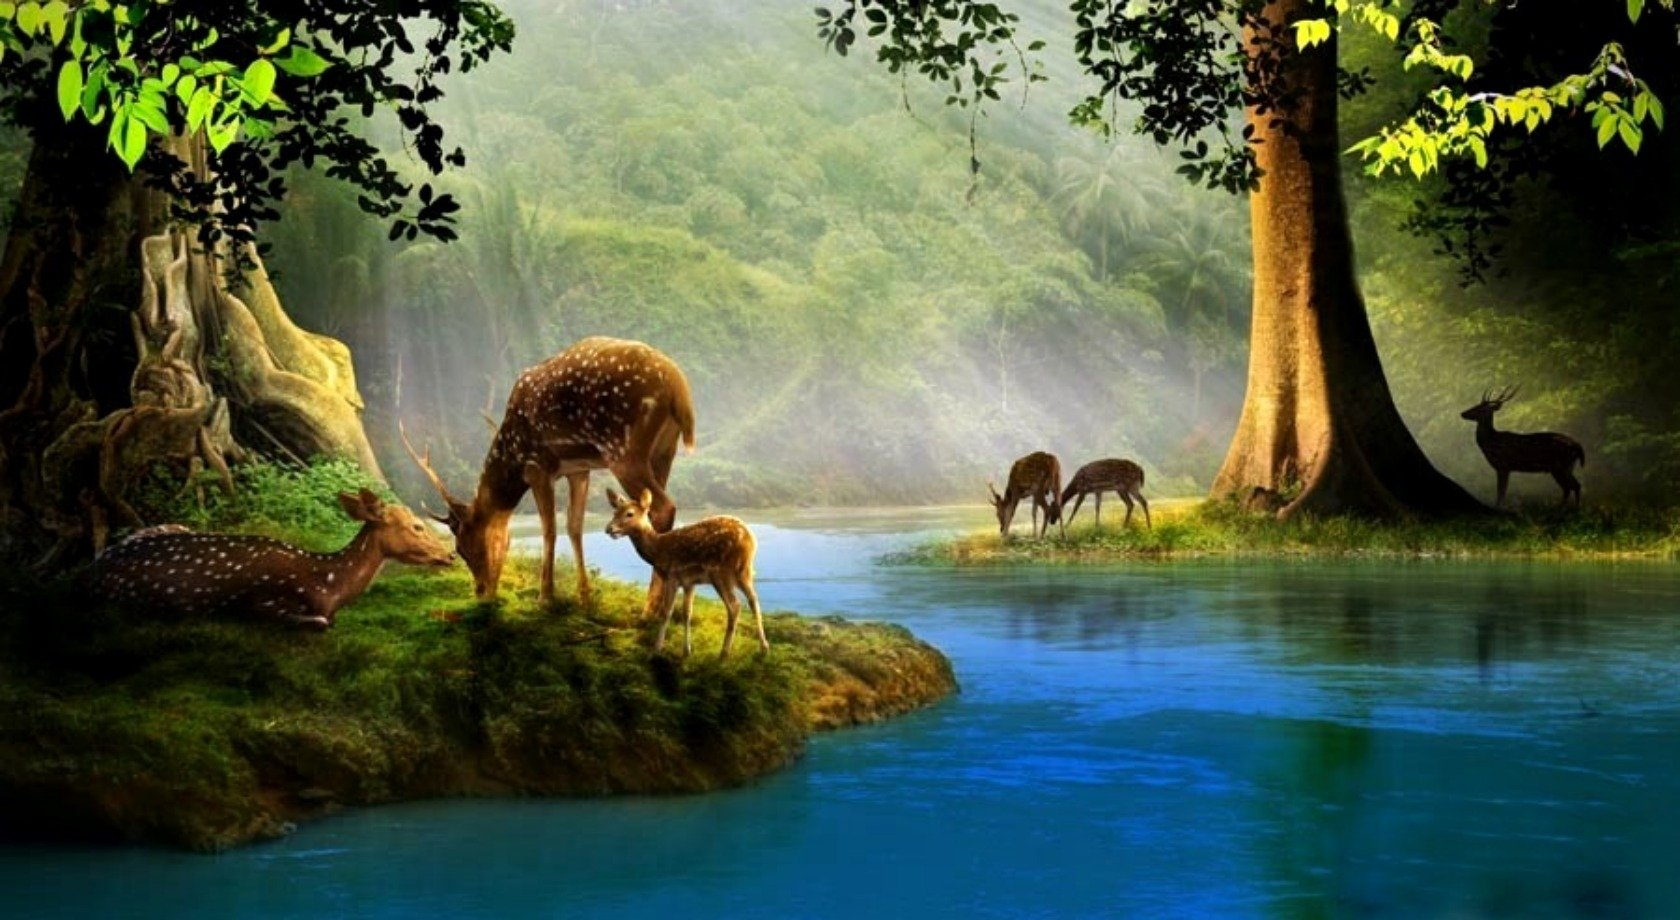 What Animal Dies If It Drinks Water